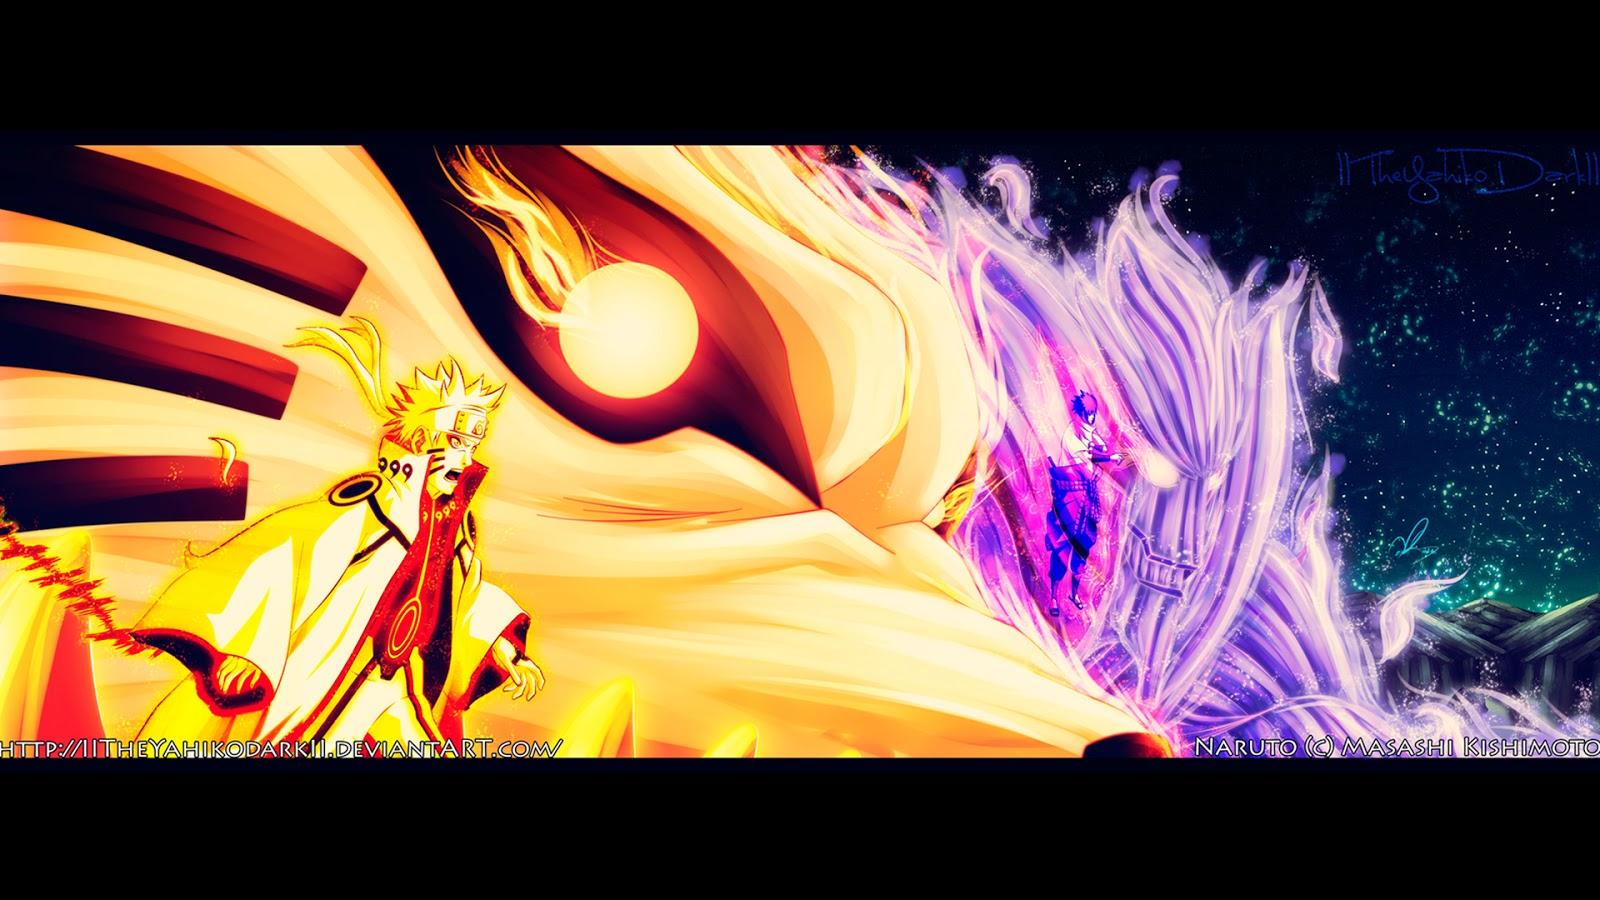 naruto kyuubi sage mode and sasuke susanoo hd anime wallpaper 1600x900